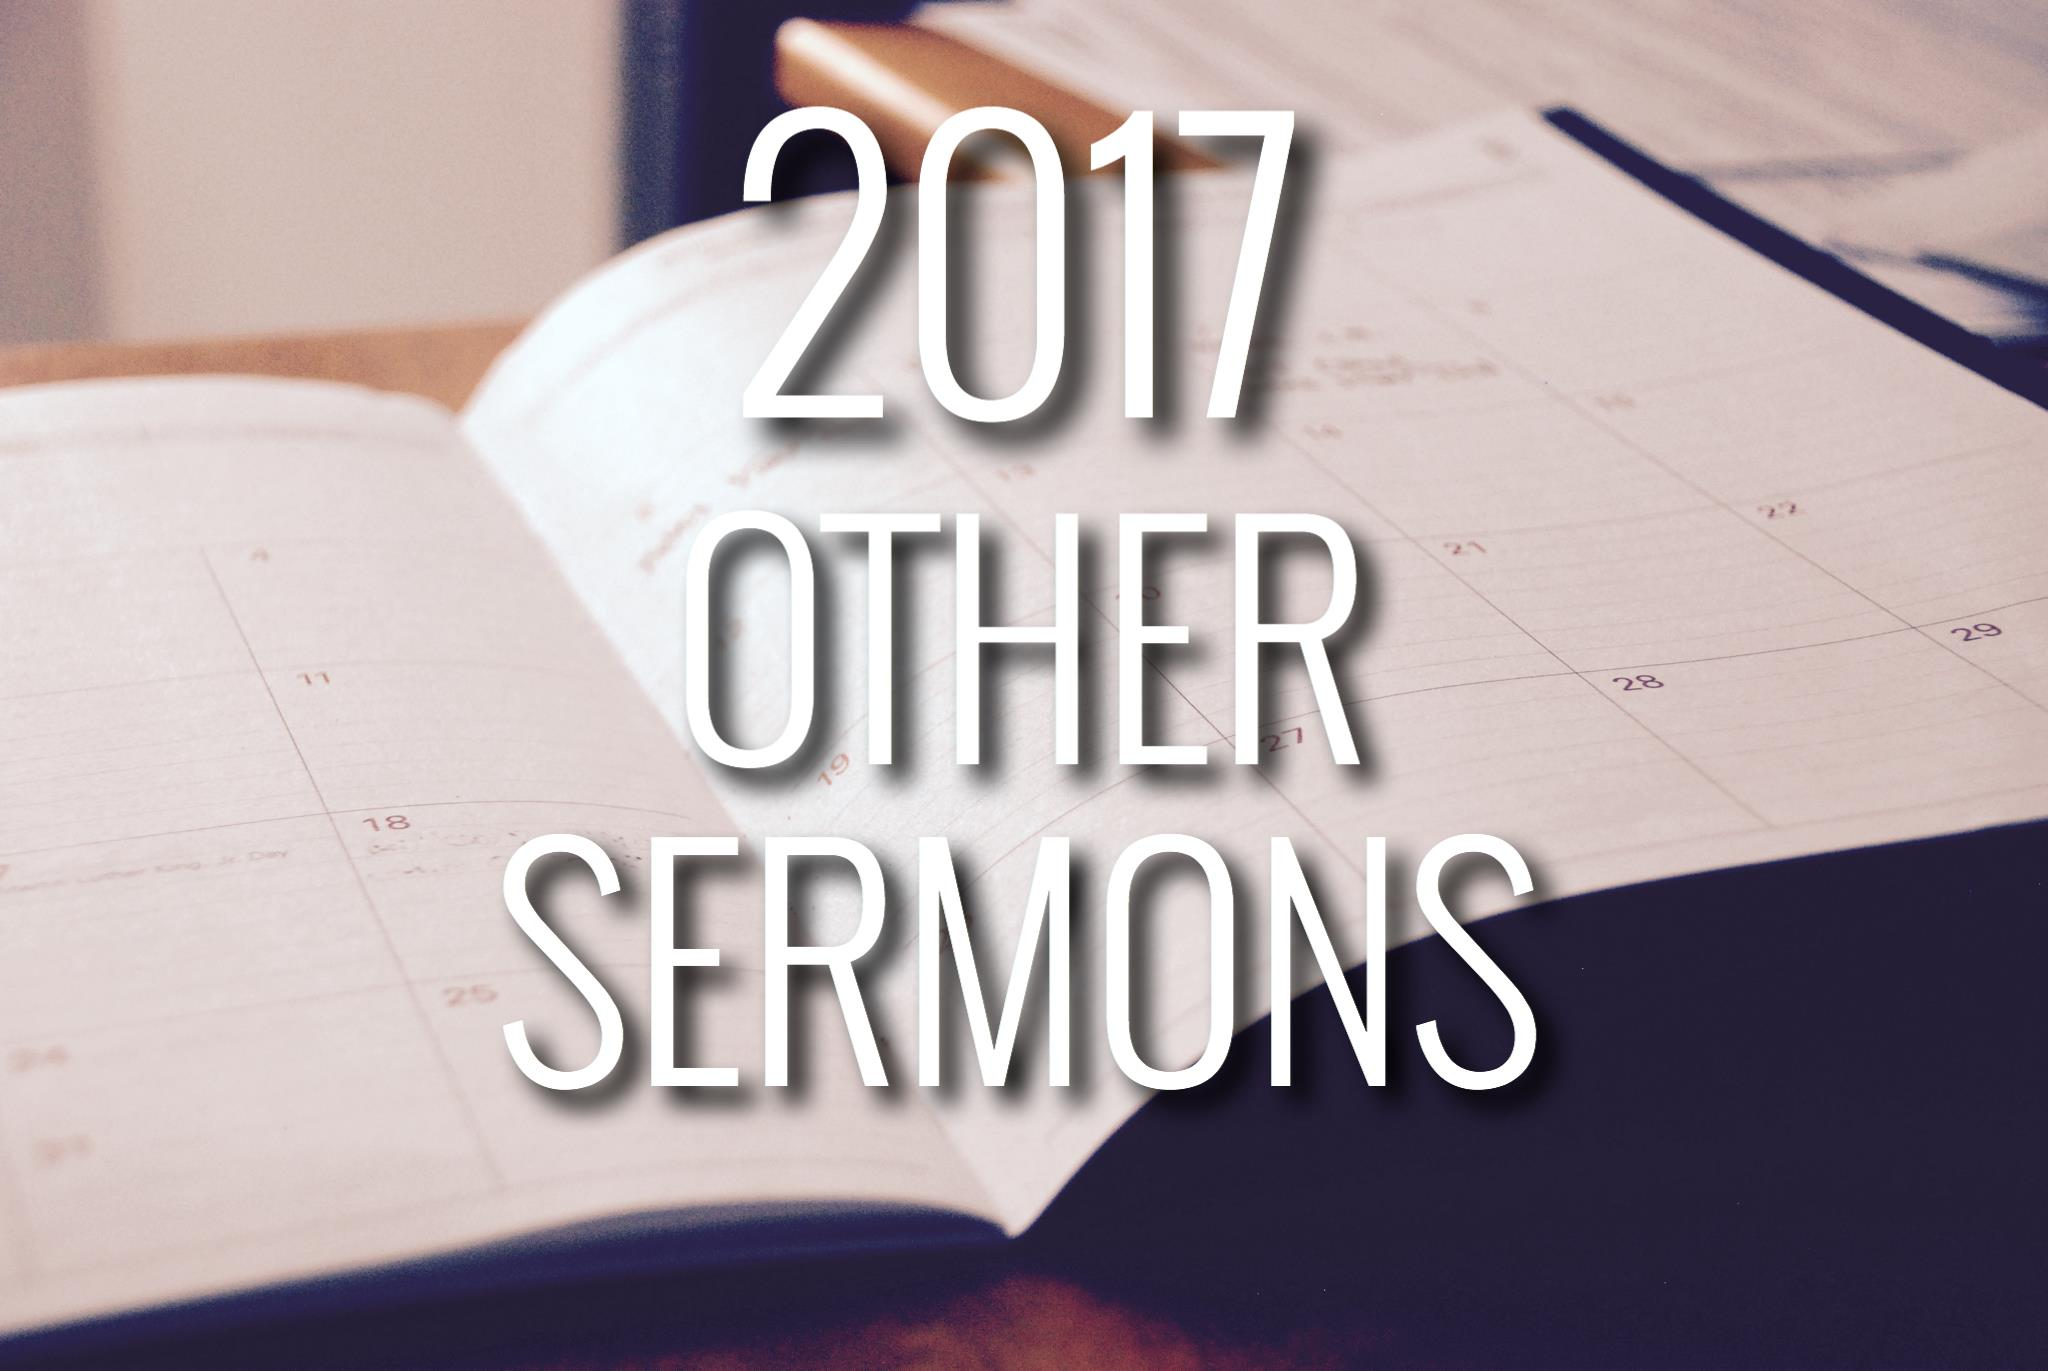 GLMC 2017 Other Sermons